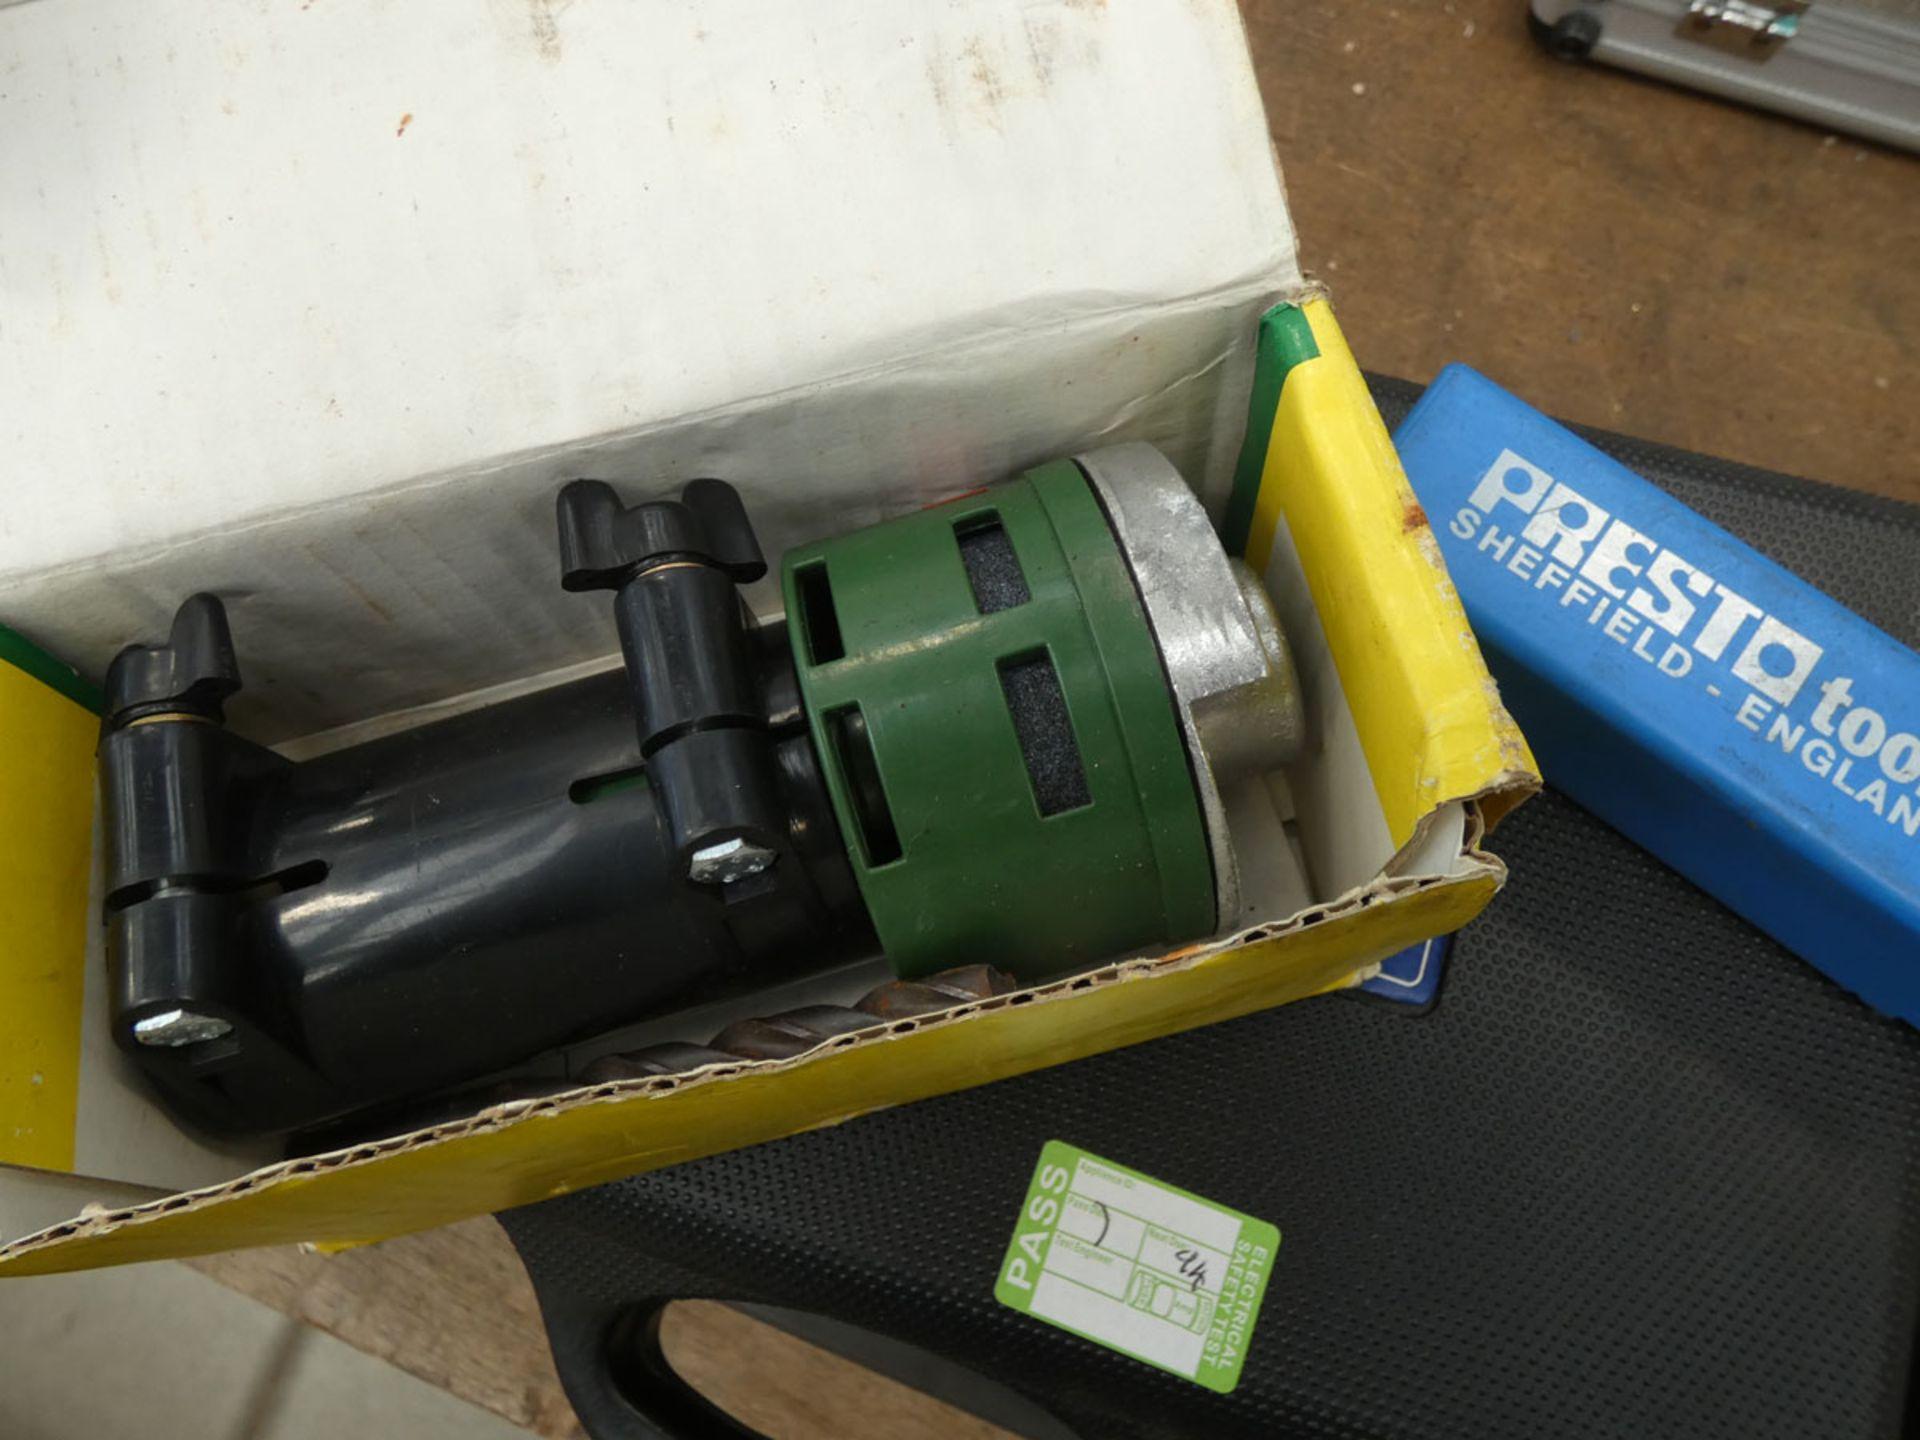 Newtool screwdriver set, Bosch drill, mini grinding heads and a drill bit set - Image 4 of 6